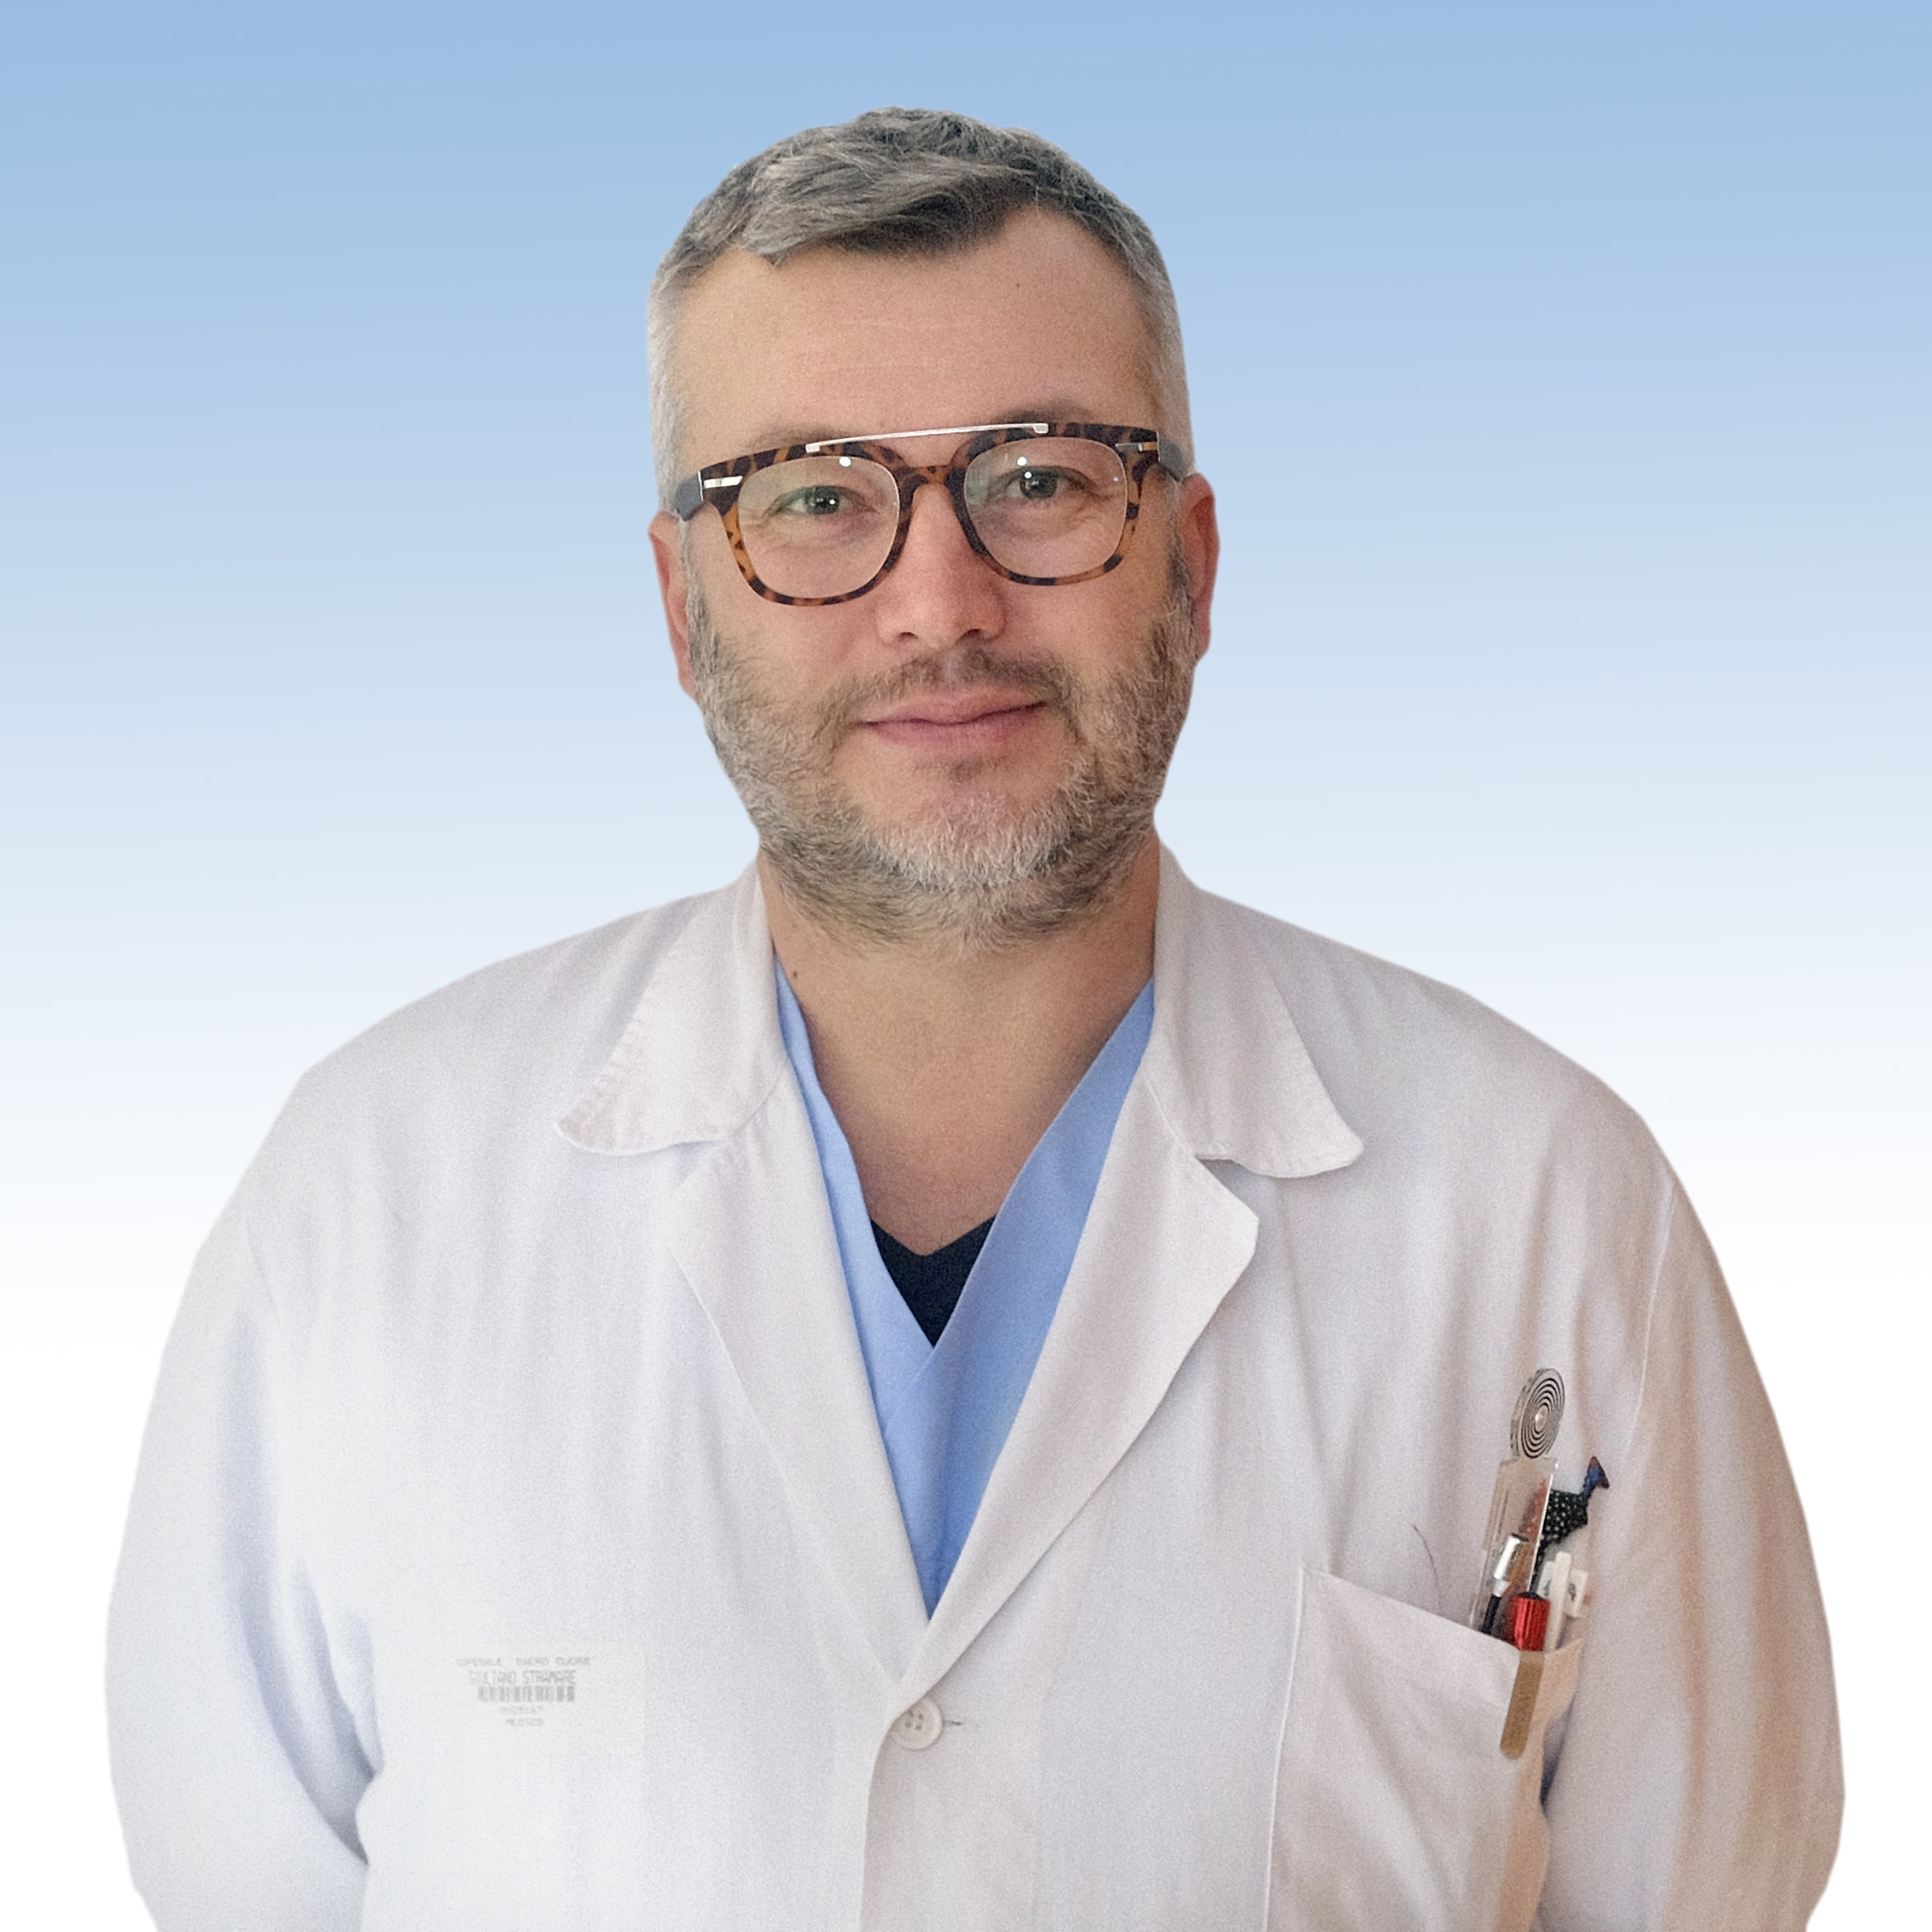 Giuliano Stramare, oculistica IRCCS Ospedale Sacro Cuore Don Calabria di Negrar